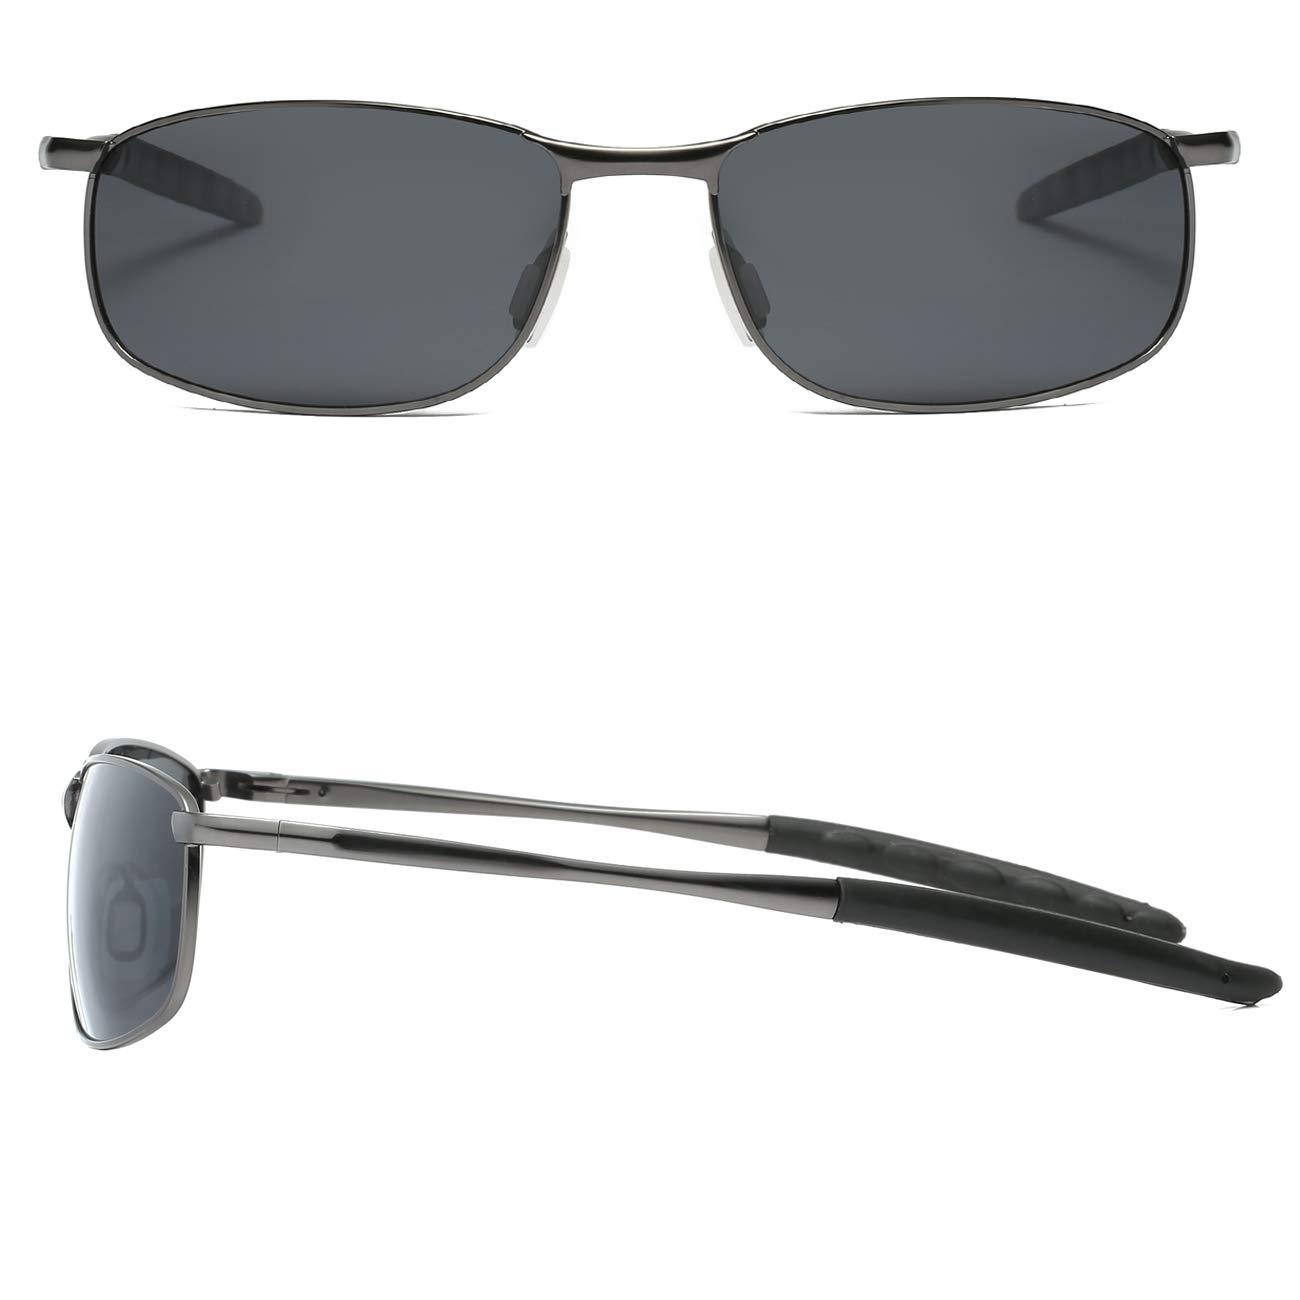 f11b02022b58 FEIDU Polarized Sport Mens Sunglasses HD Lens Metal Frame Driving ...